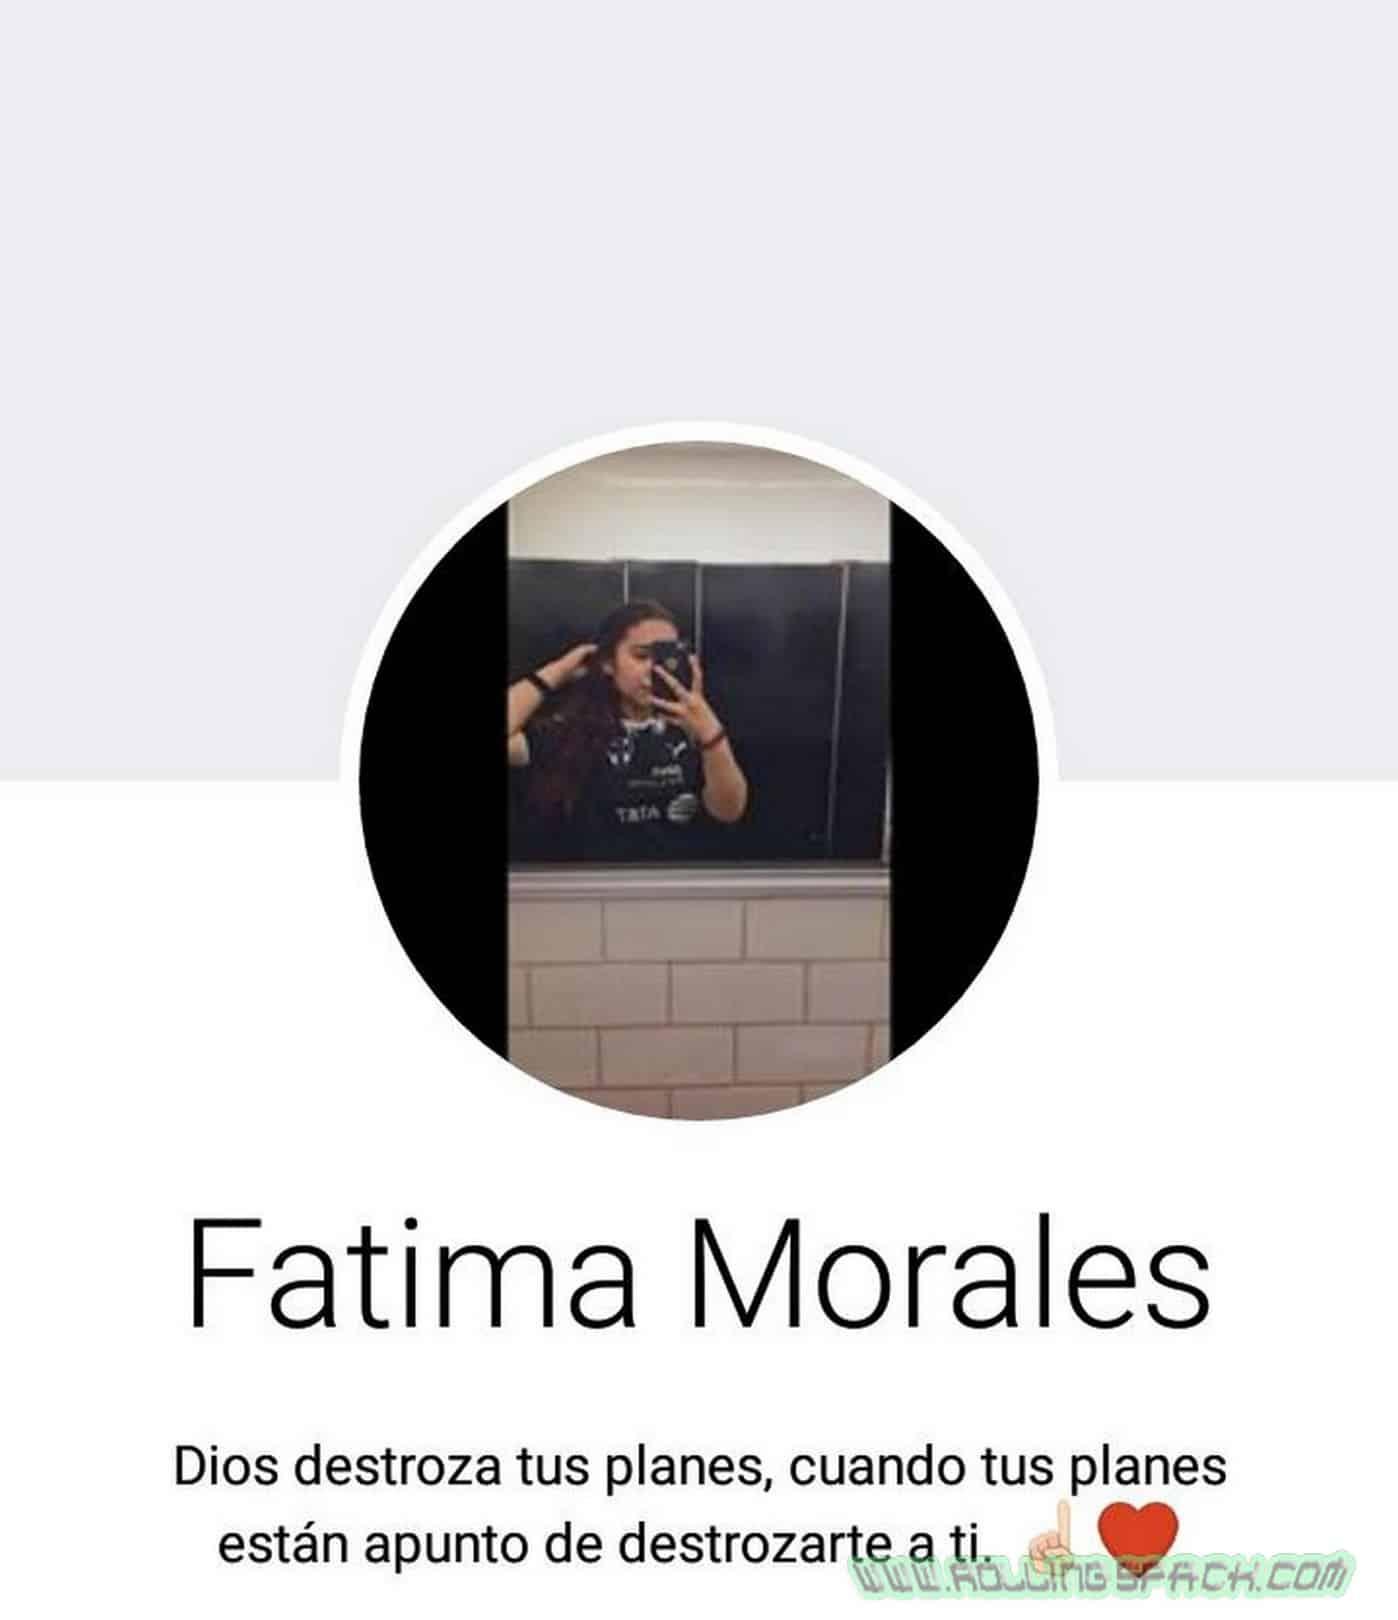 Pack De Fatima Morales Jovencita De Facebook + 3 Videos